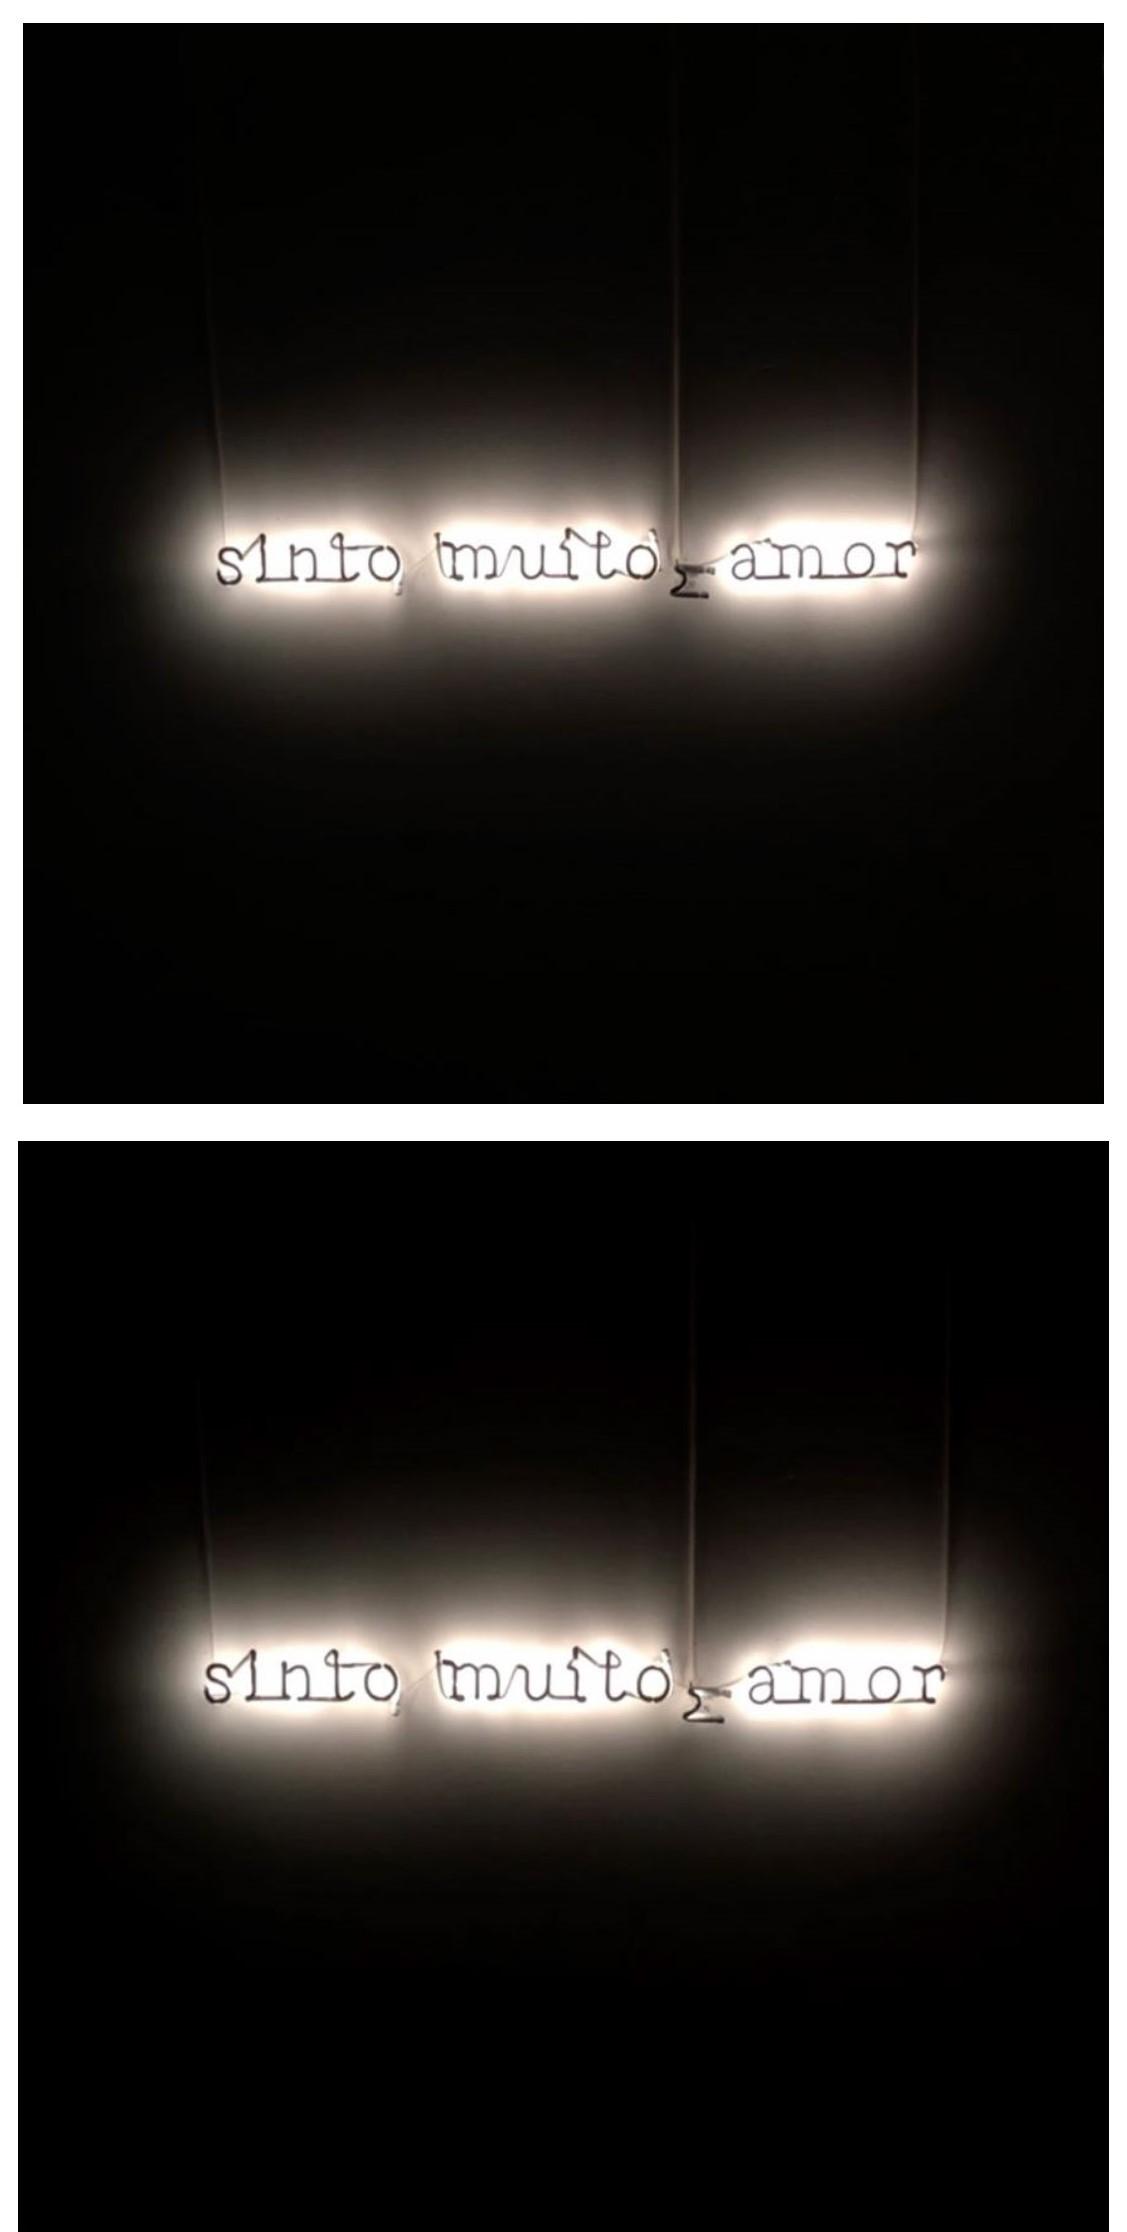 sinto muito amor, 2020 Neon com Pintura preta  10 x 80 cm PA1